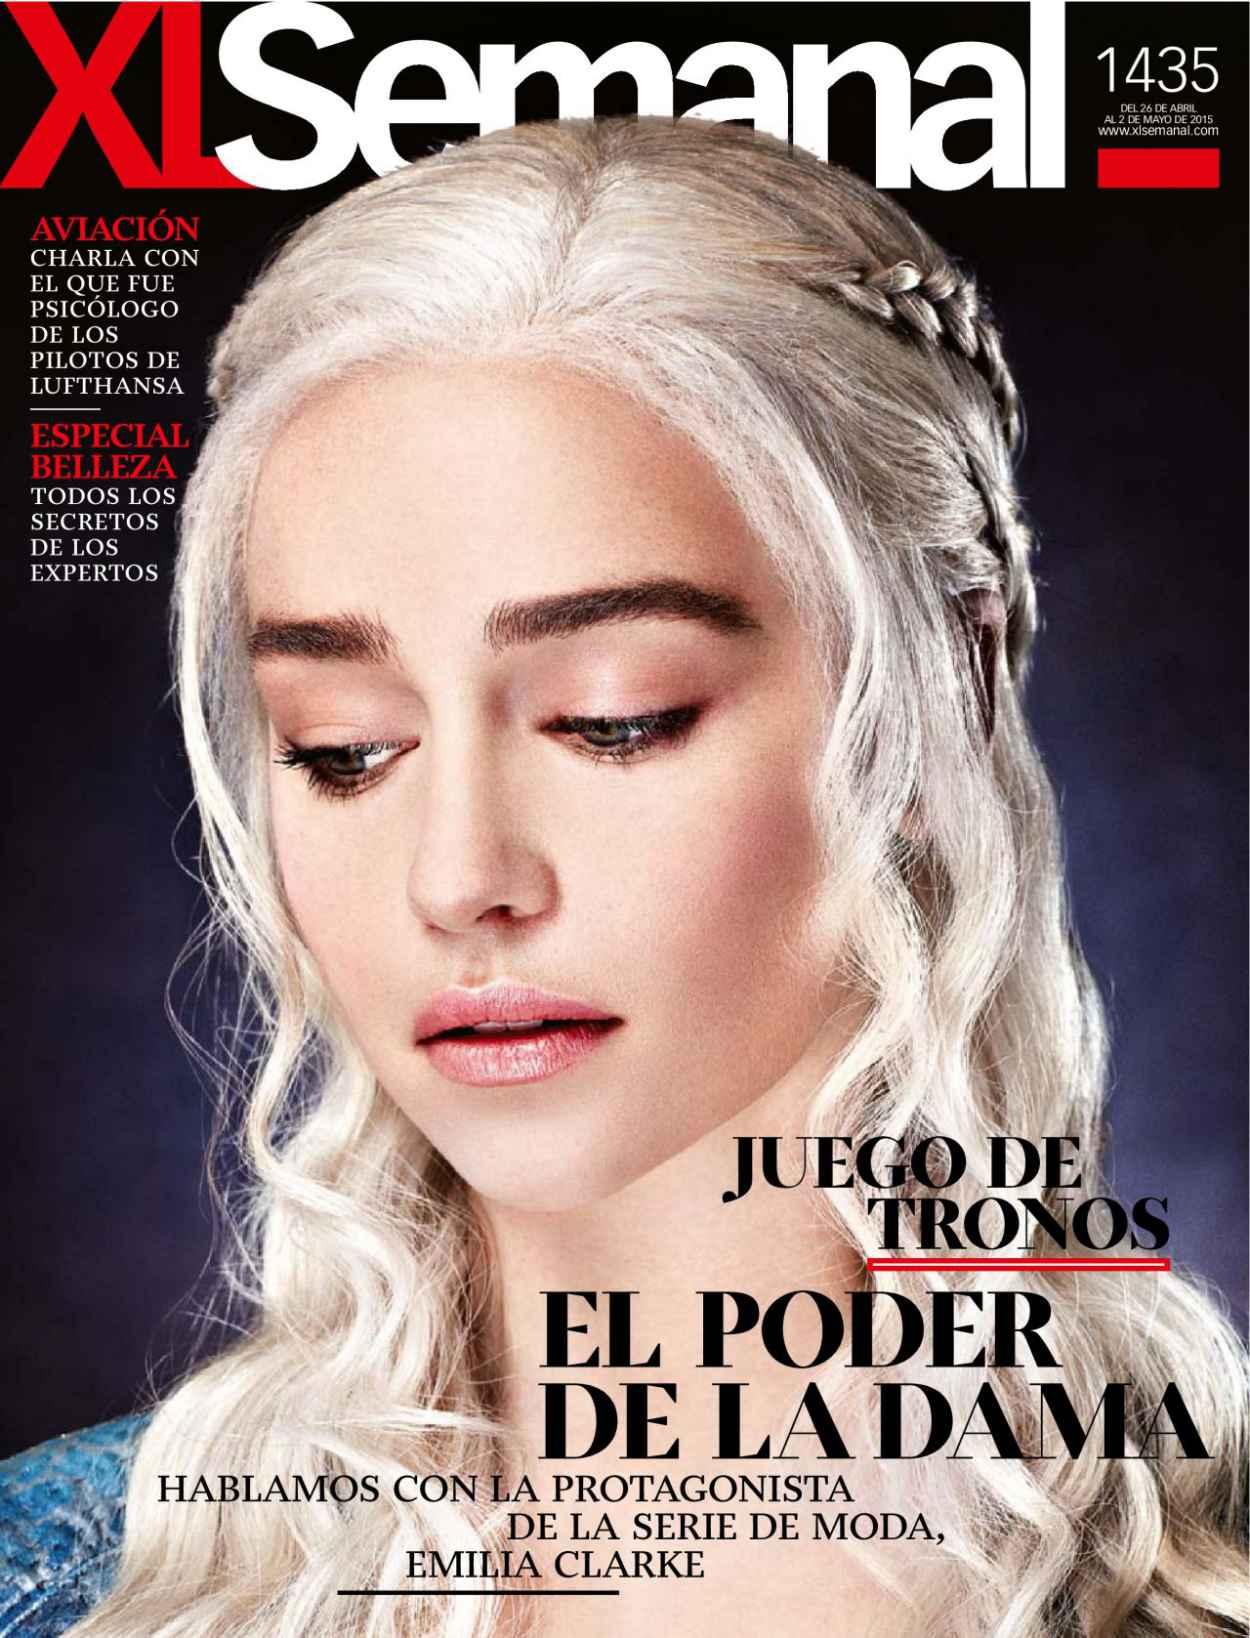 Emilia Clarke - Xl Semanal Magazine April 2015 Issue-2